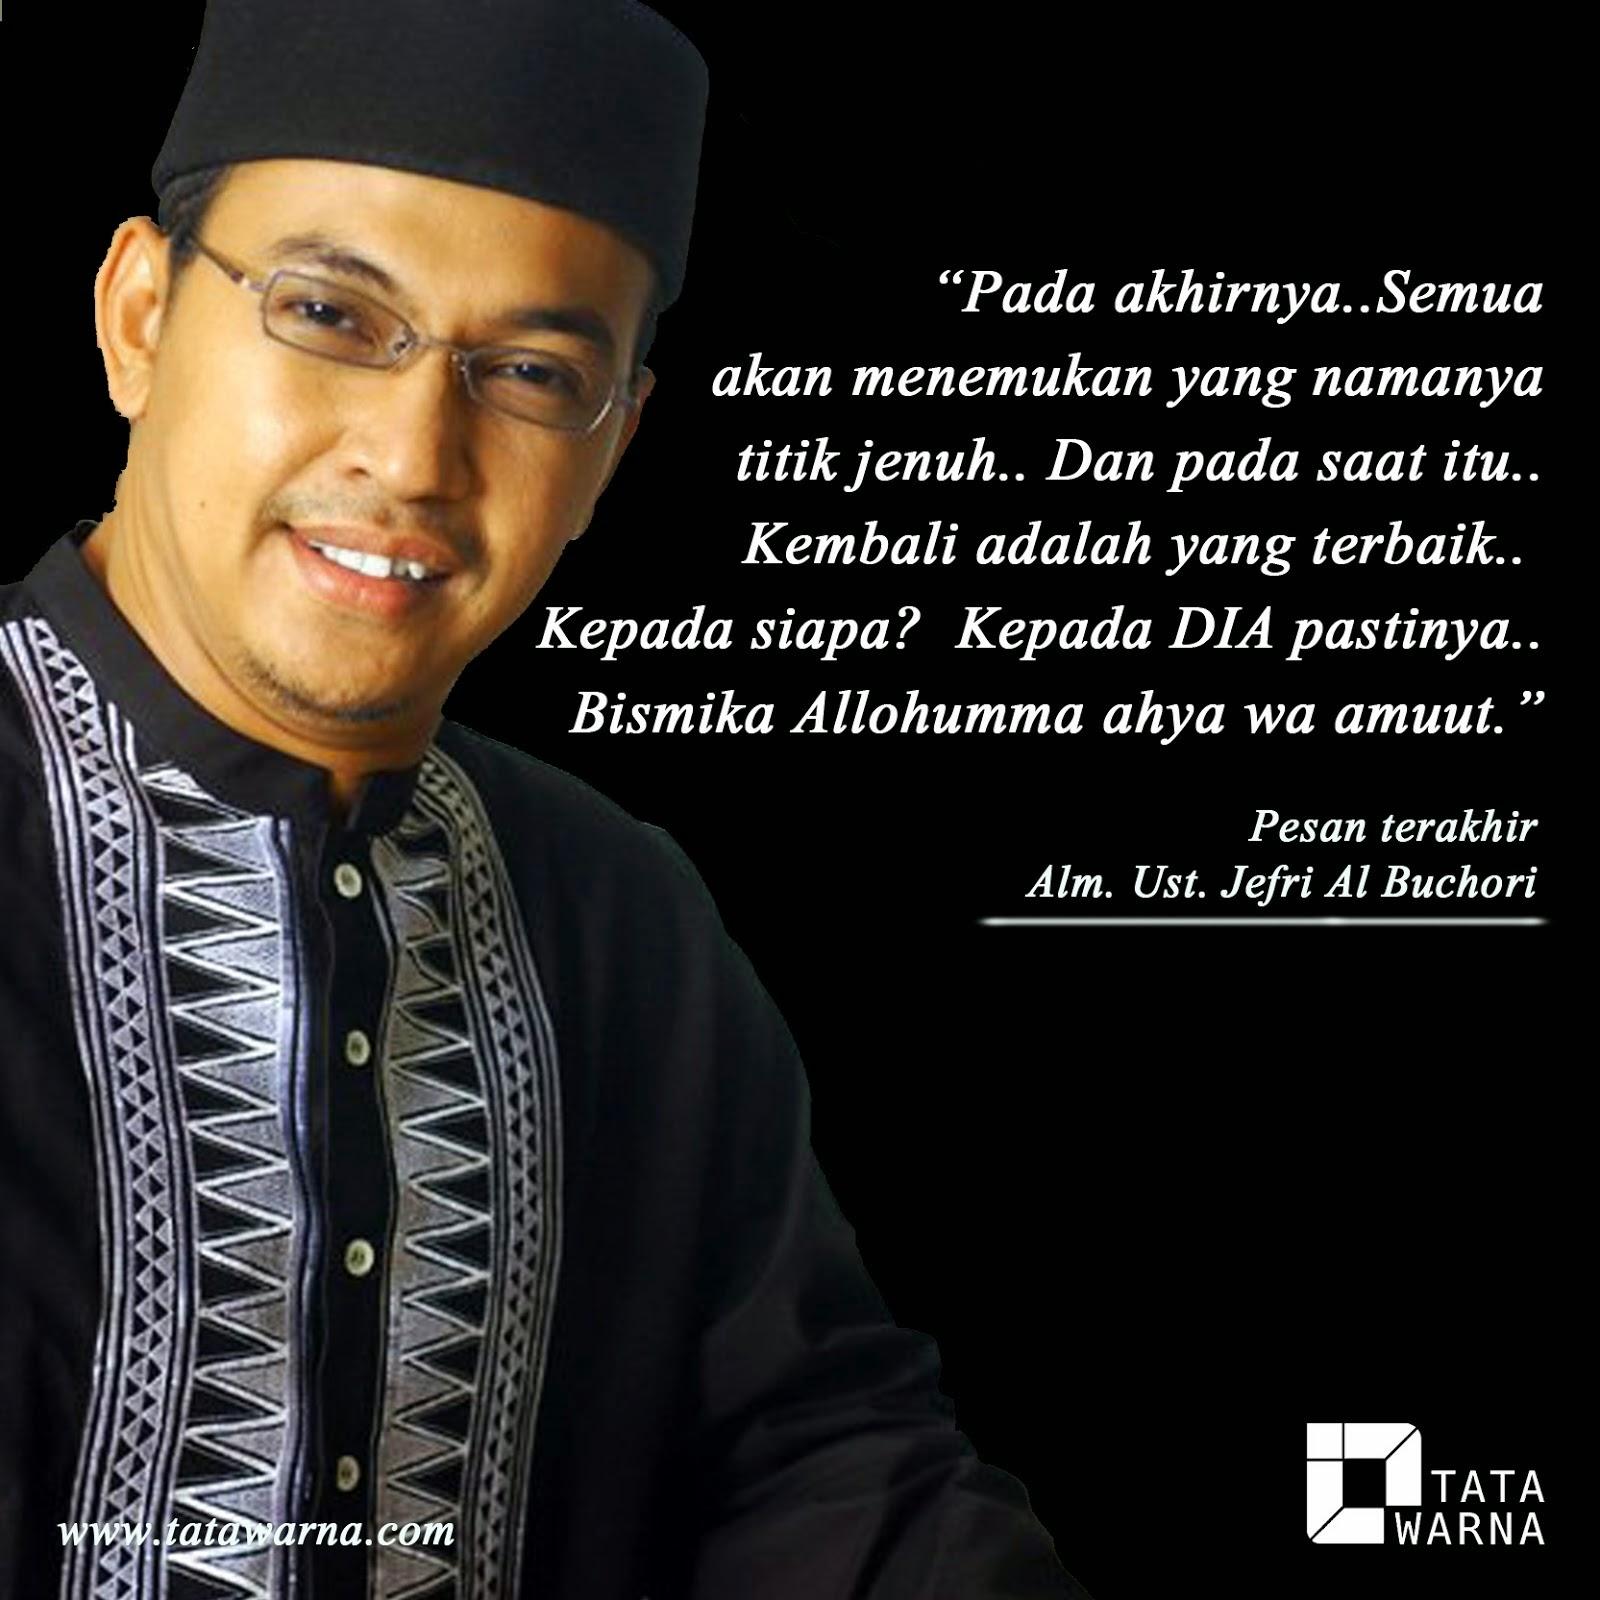 Islam Itu Indah Kata Kata Mutiara Ustad Jefri Al Buchori